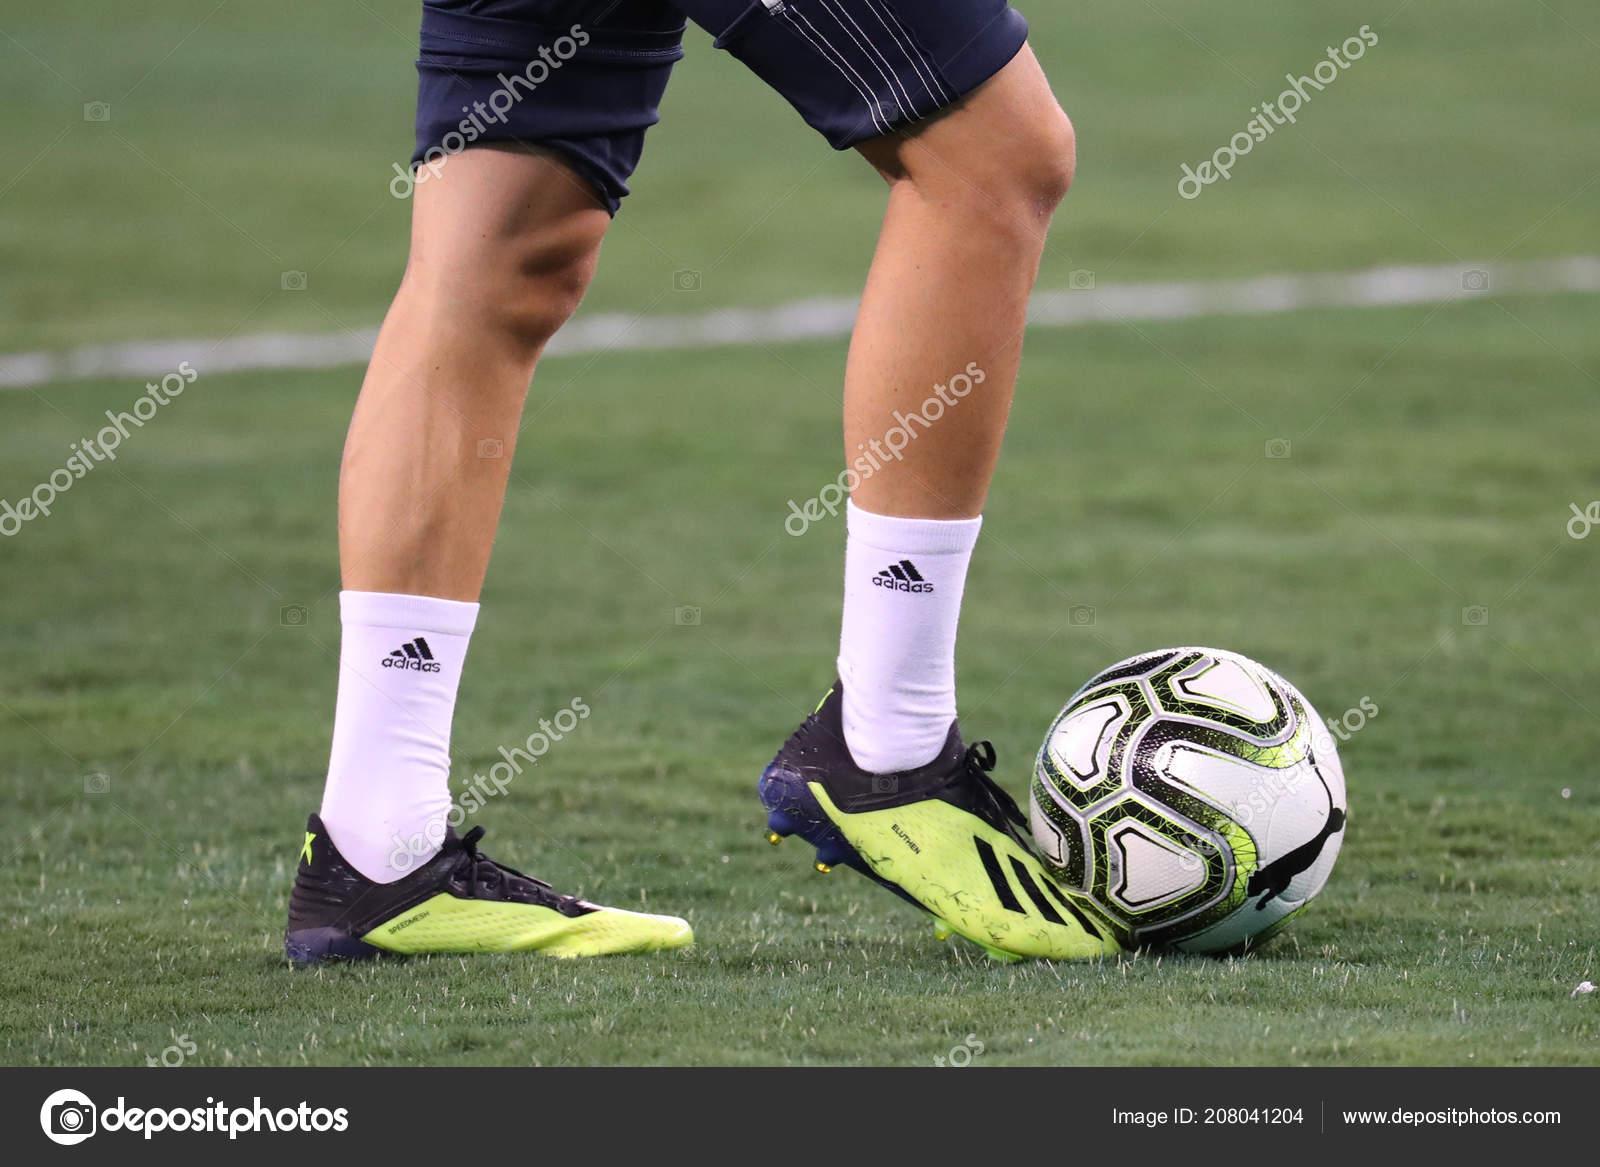 Бутсы футболистов реал мадрида